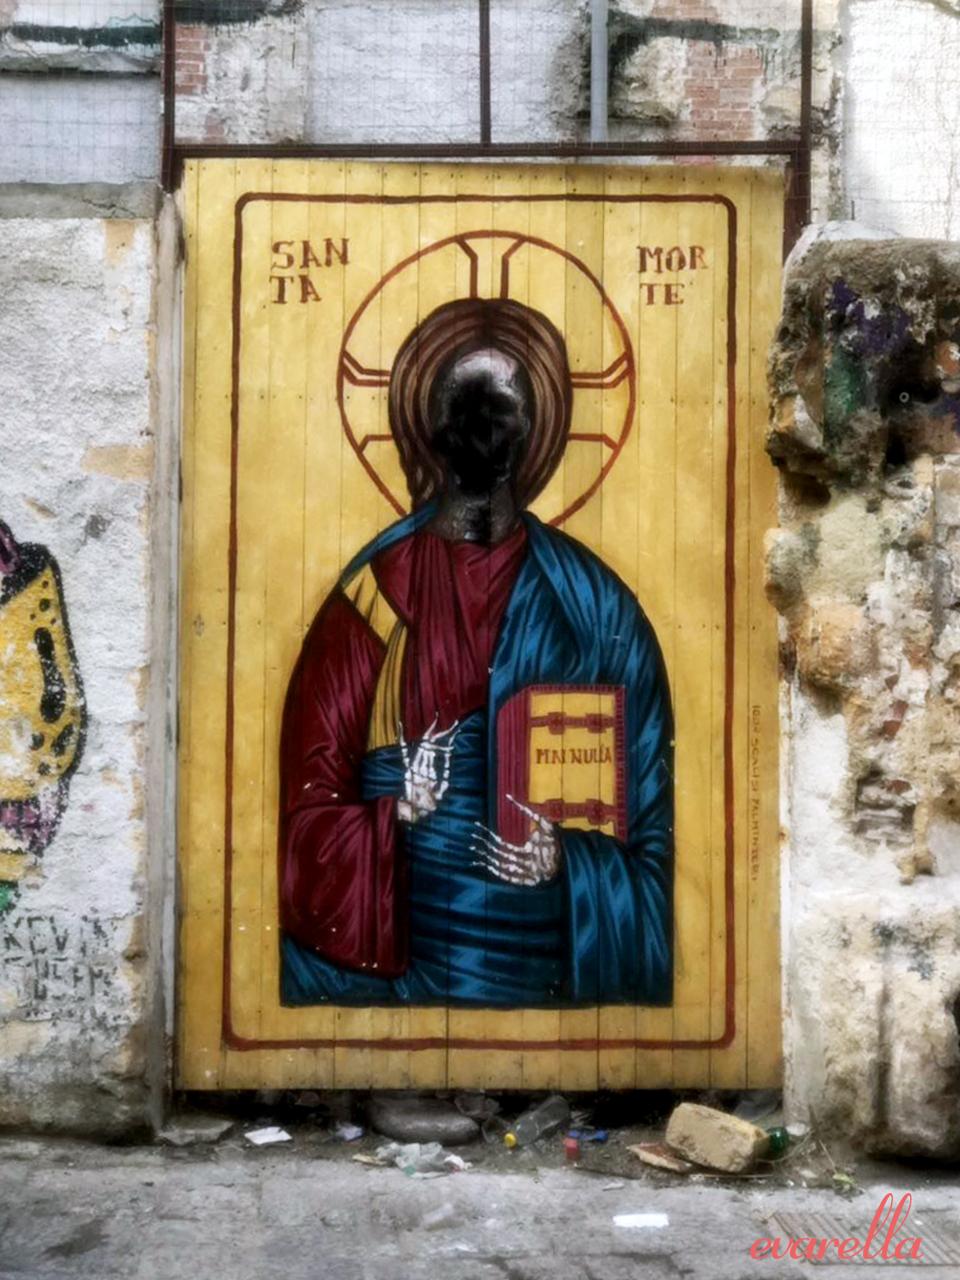 streetart palermo santamorte